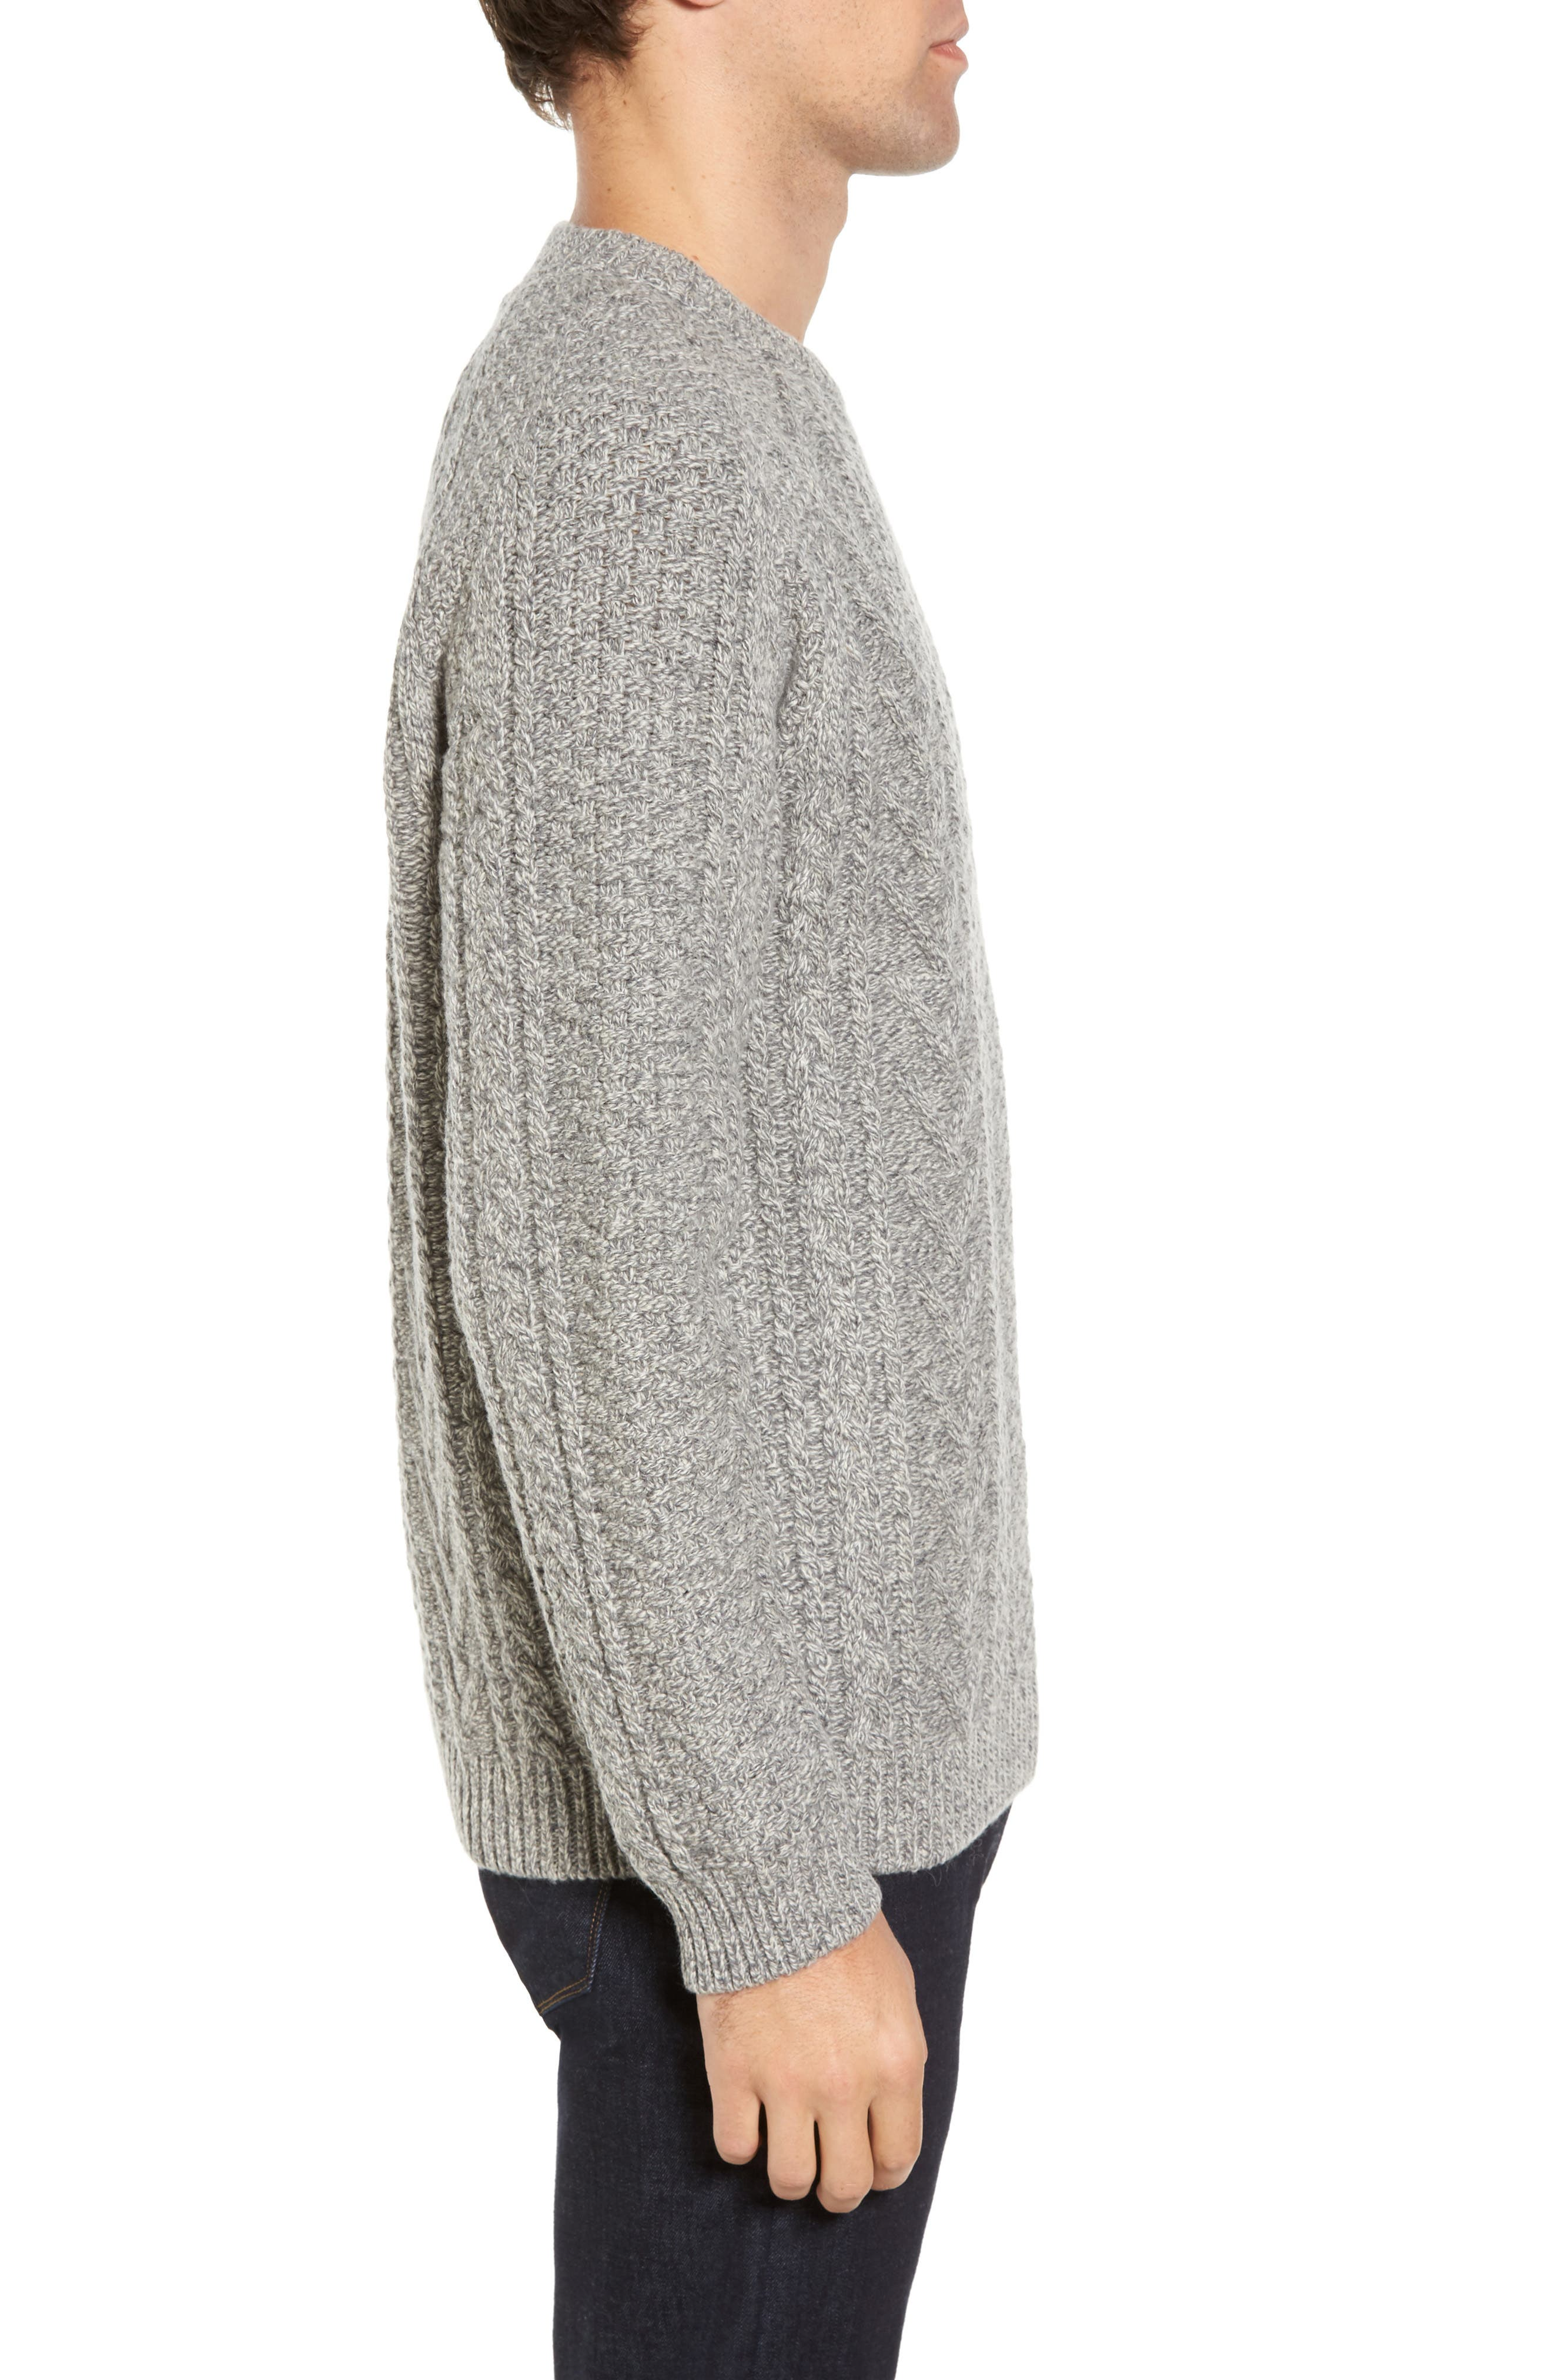 Fisherman Knit Wool Blend Sweater,                             Alternate thumbnail 5, color,